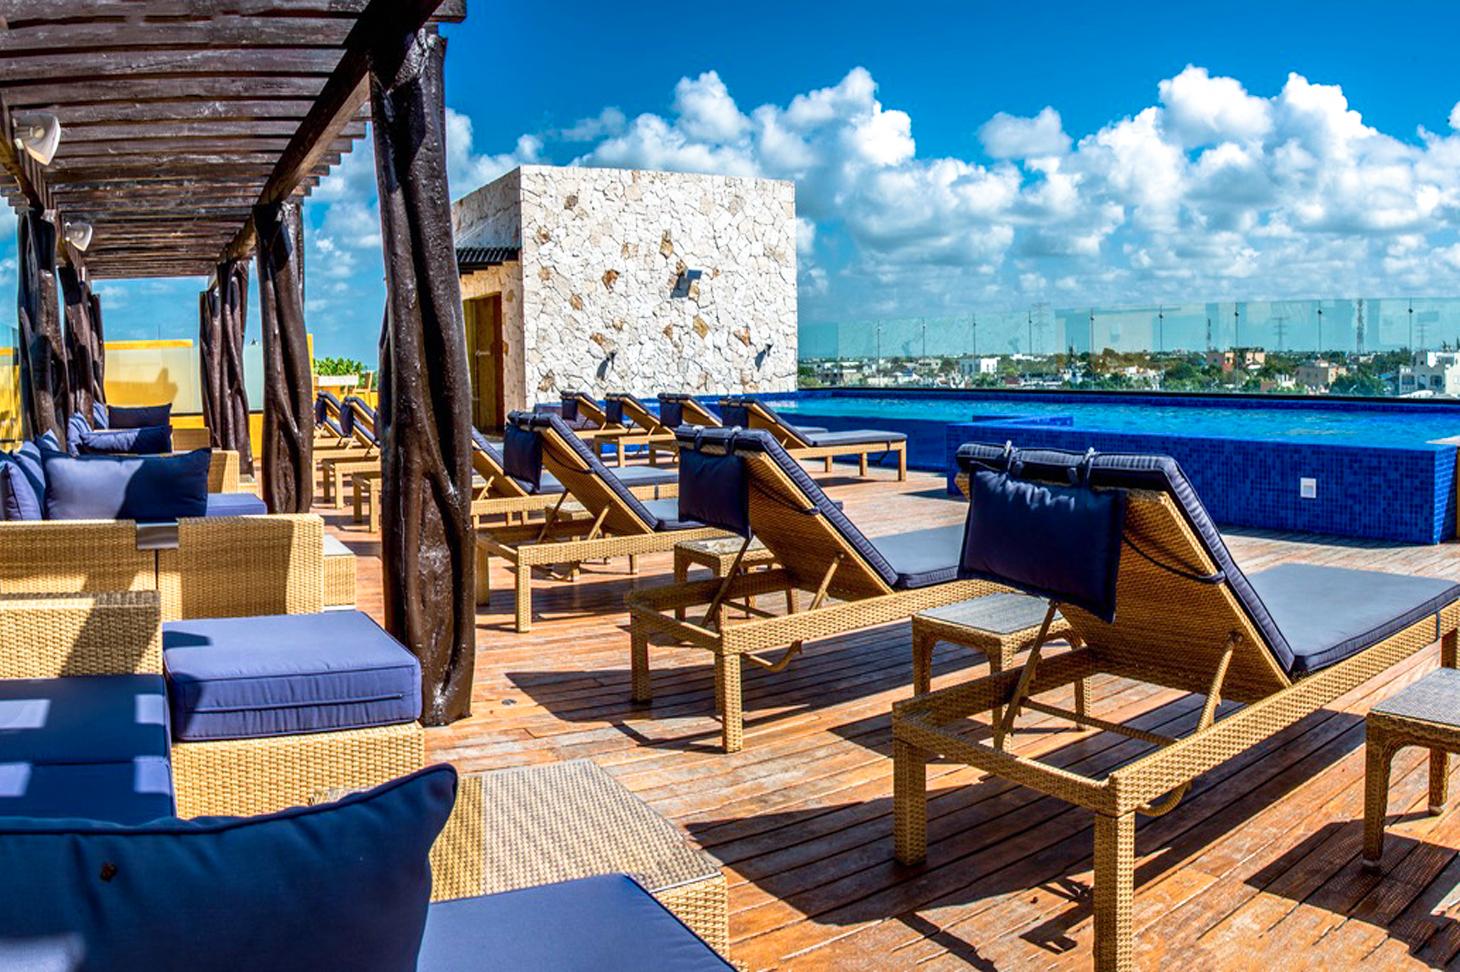 Lunda Playa del Carmen Condo Home For Sale Real Estate to Buy